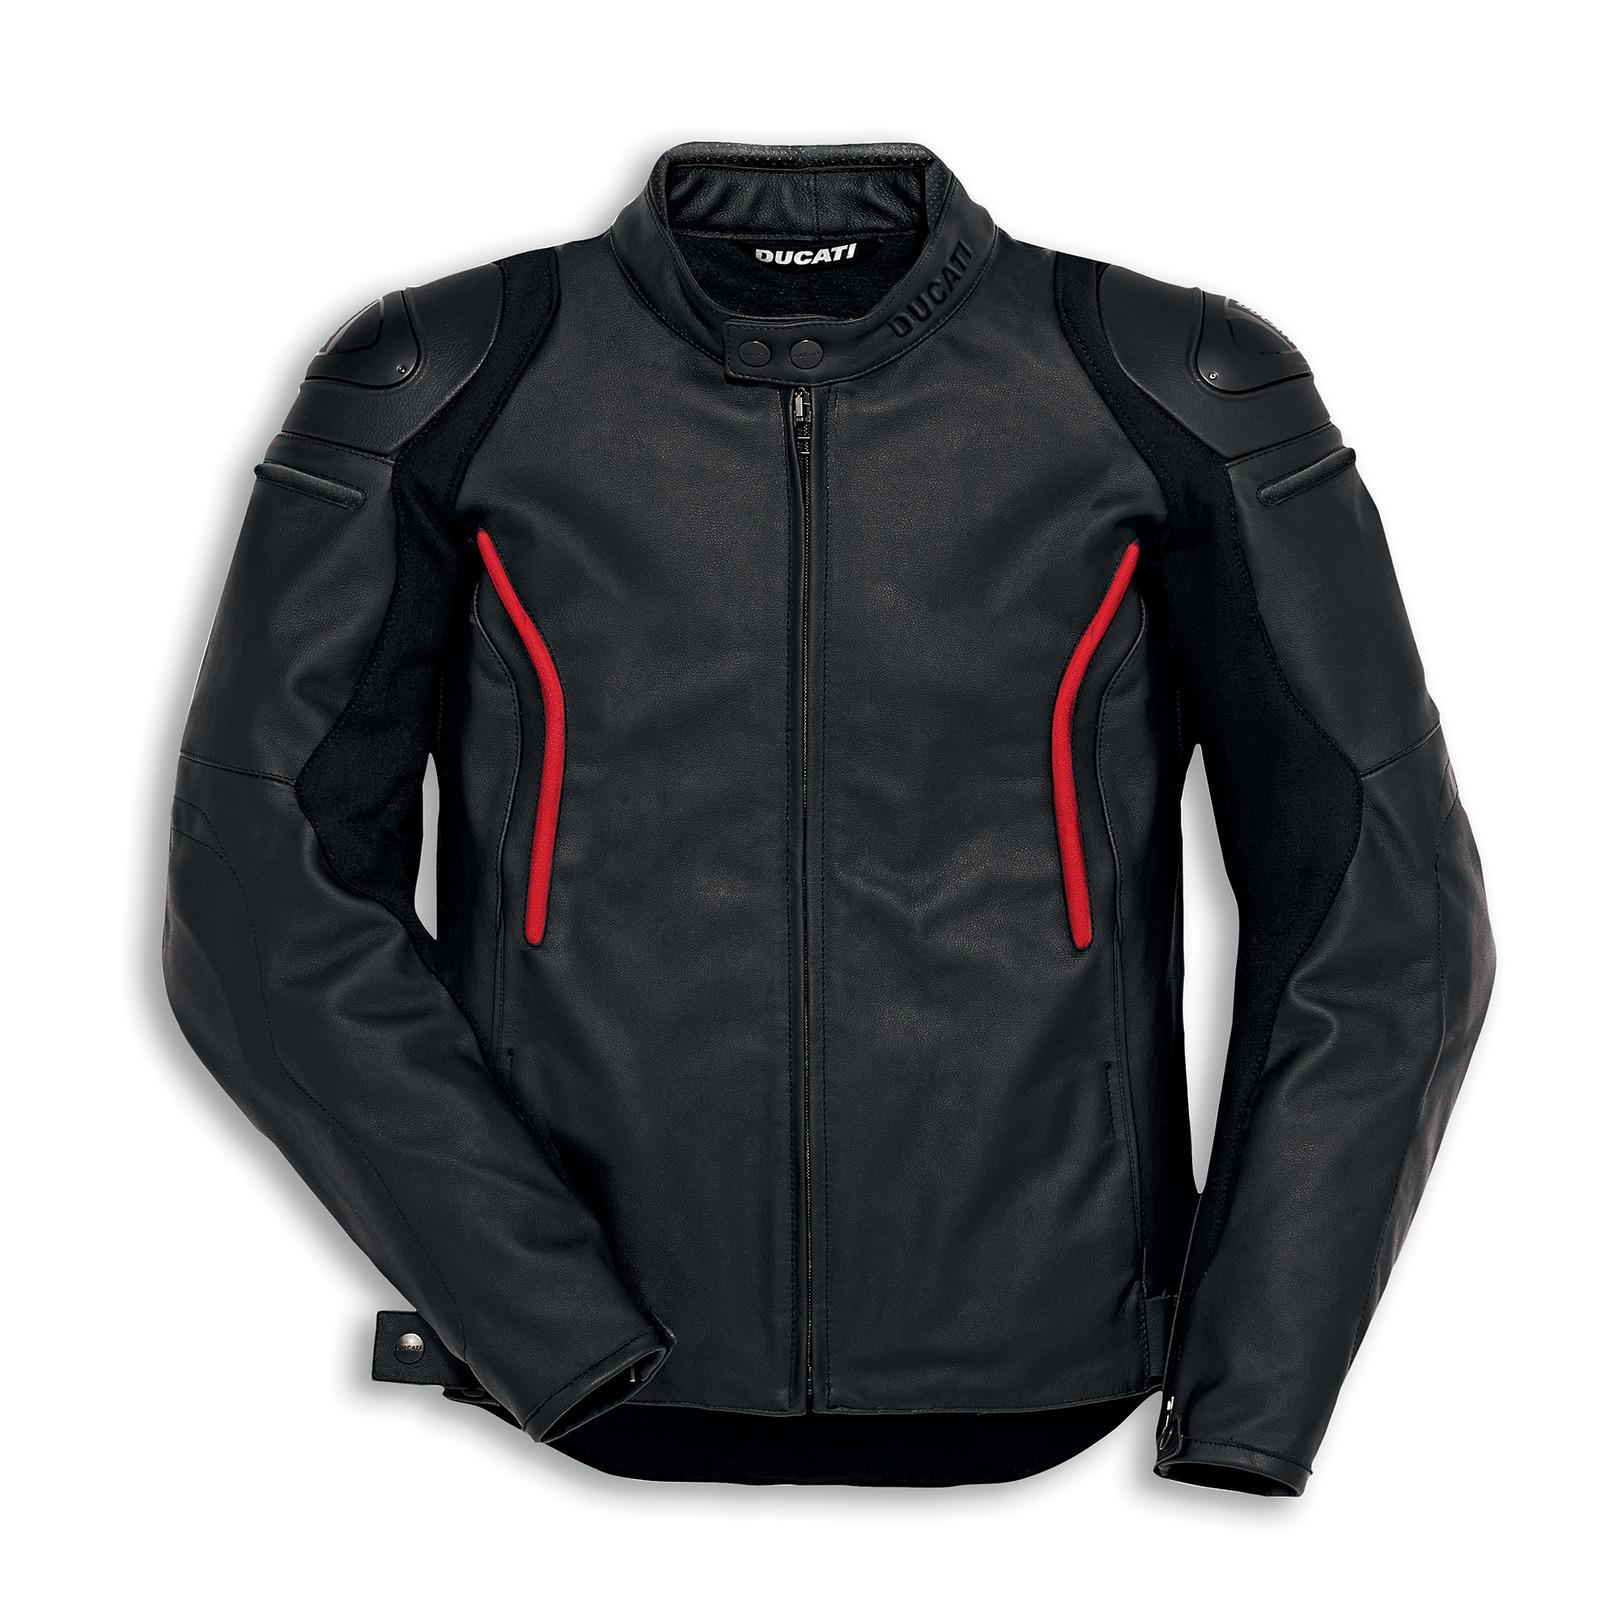 0ff0c4e43 Ducati Genuine Stealth C2 Standard Leather Jacket | Ducati | Ducati Apparel  & Gifts | Ducati Jackets